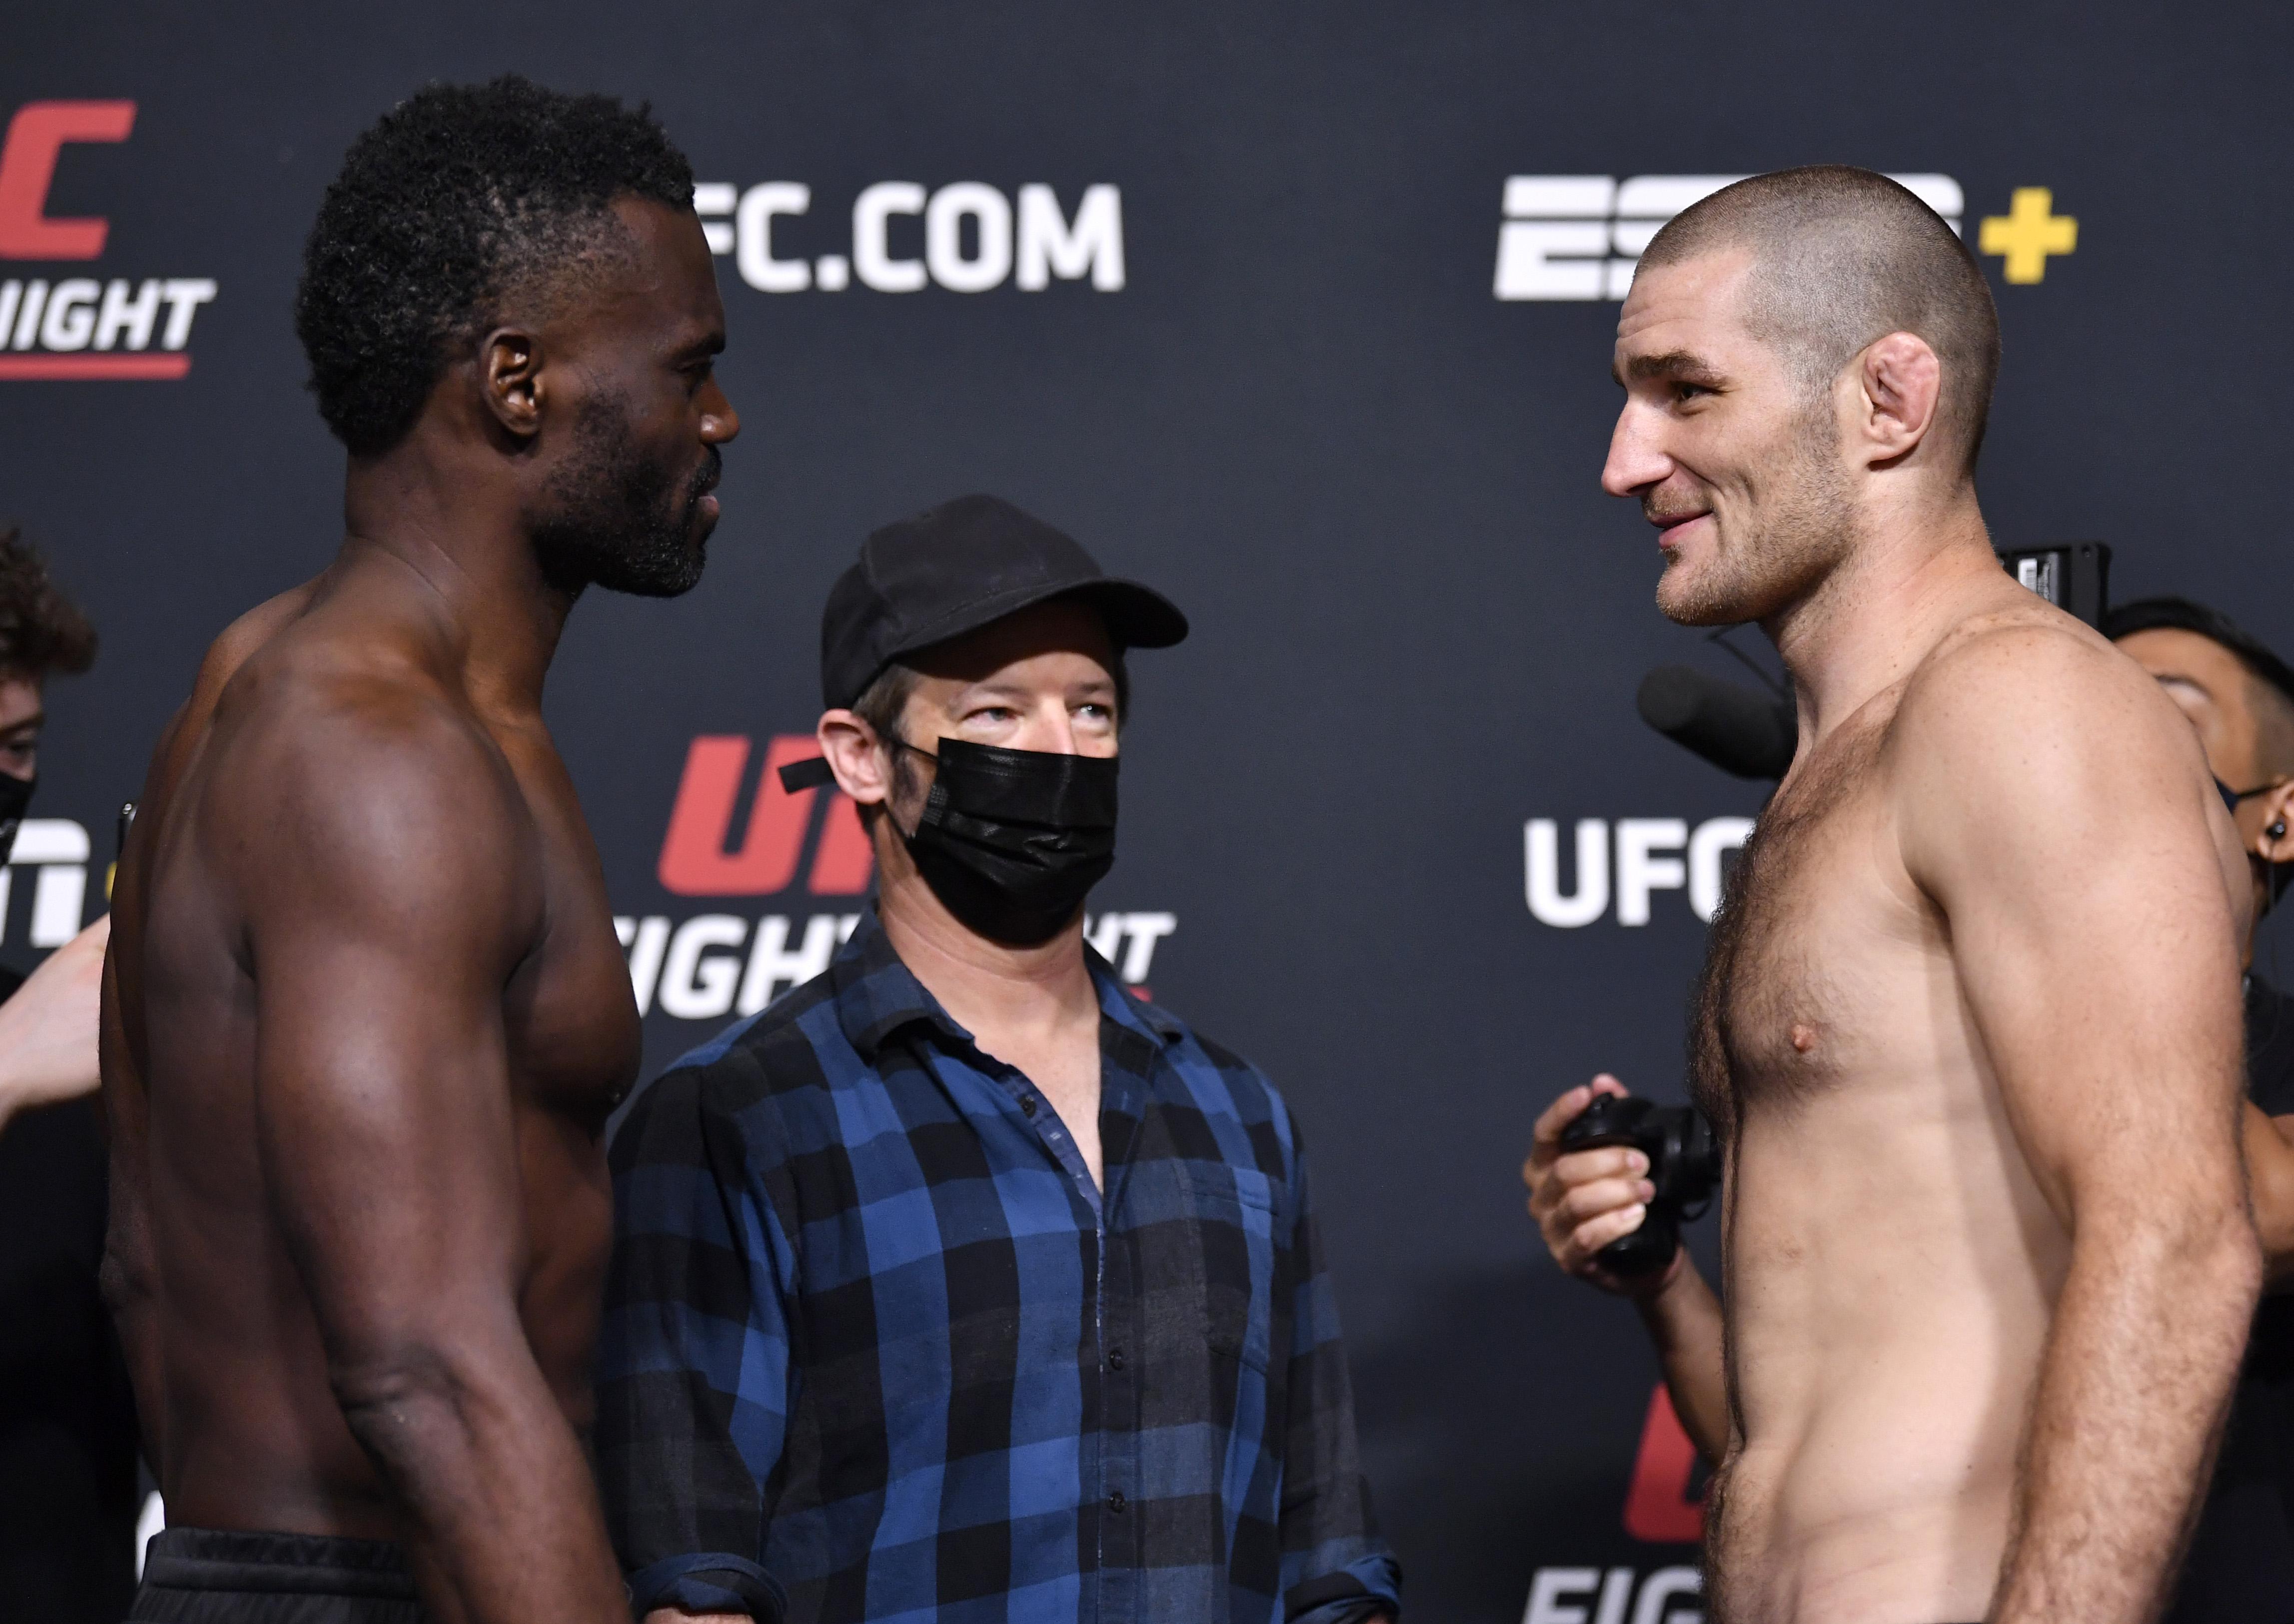 Uriah Hall和Sean Strickland在UFC拉斯维加斯33